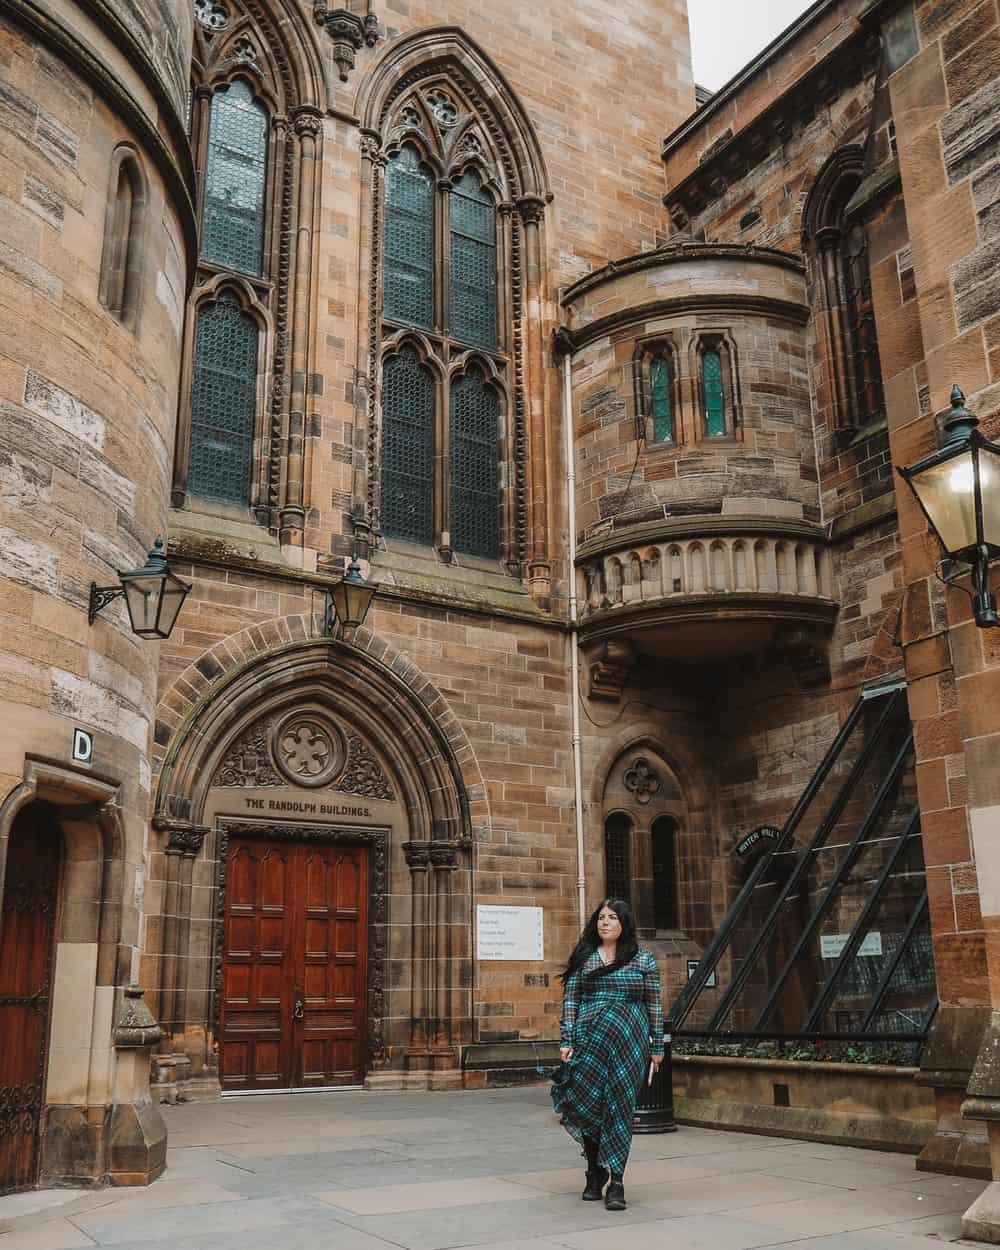 The University of Glasgow Outlander location